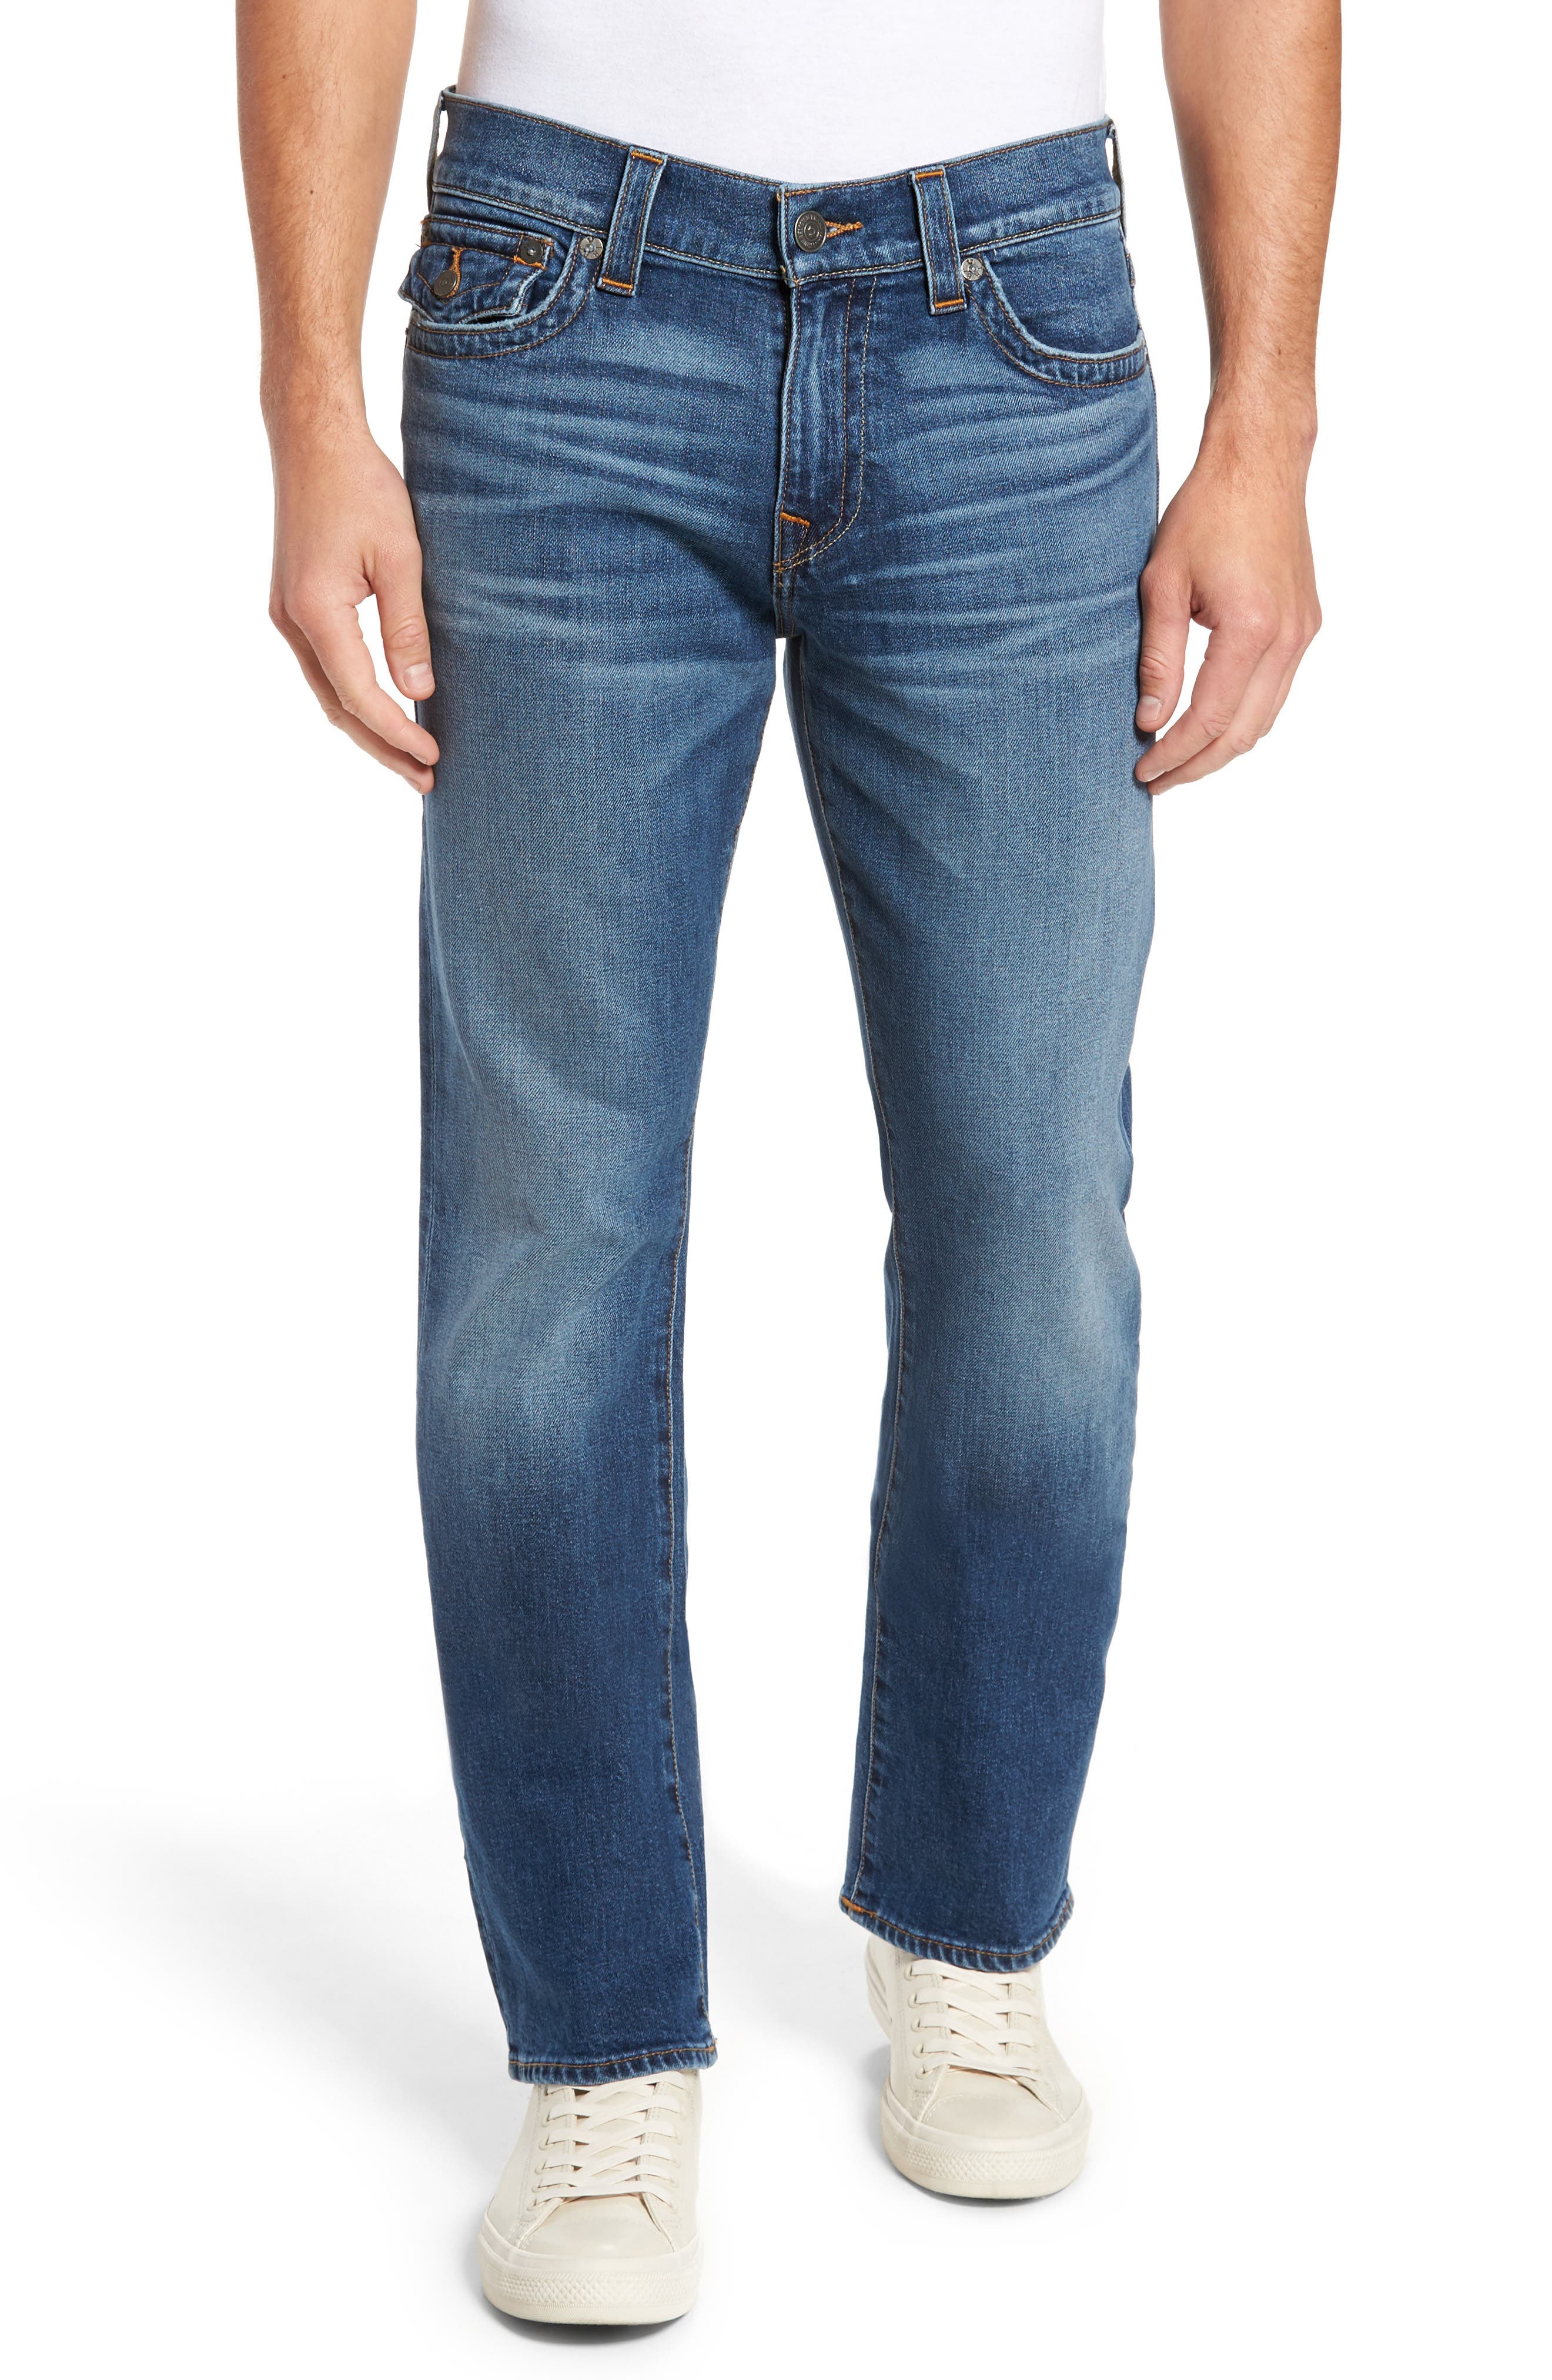 True Religion Brand Jeans Ricky Relaxed Fit Jeans (Indigo Traveler)